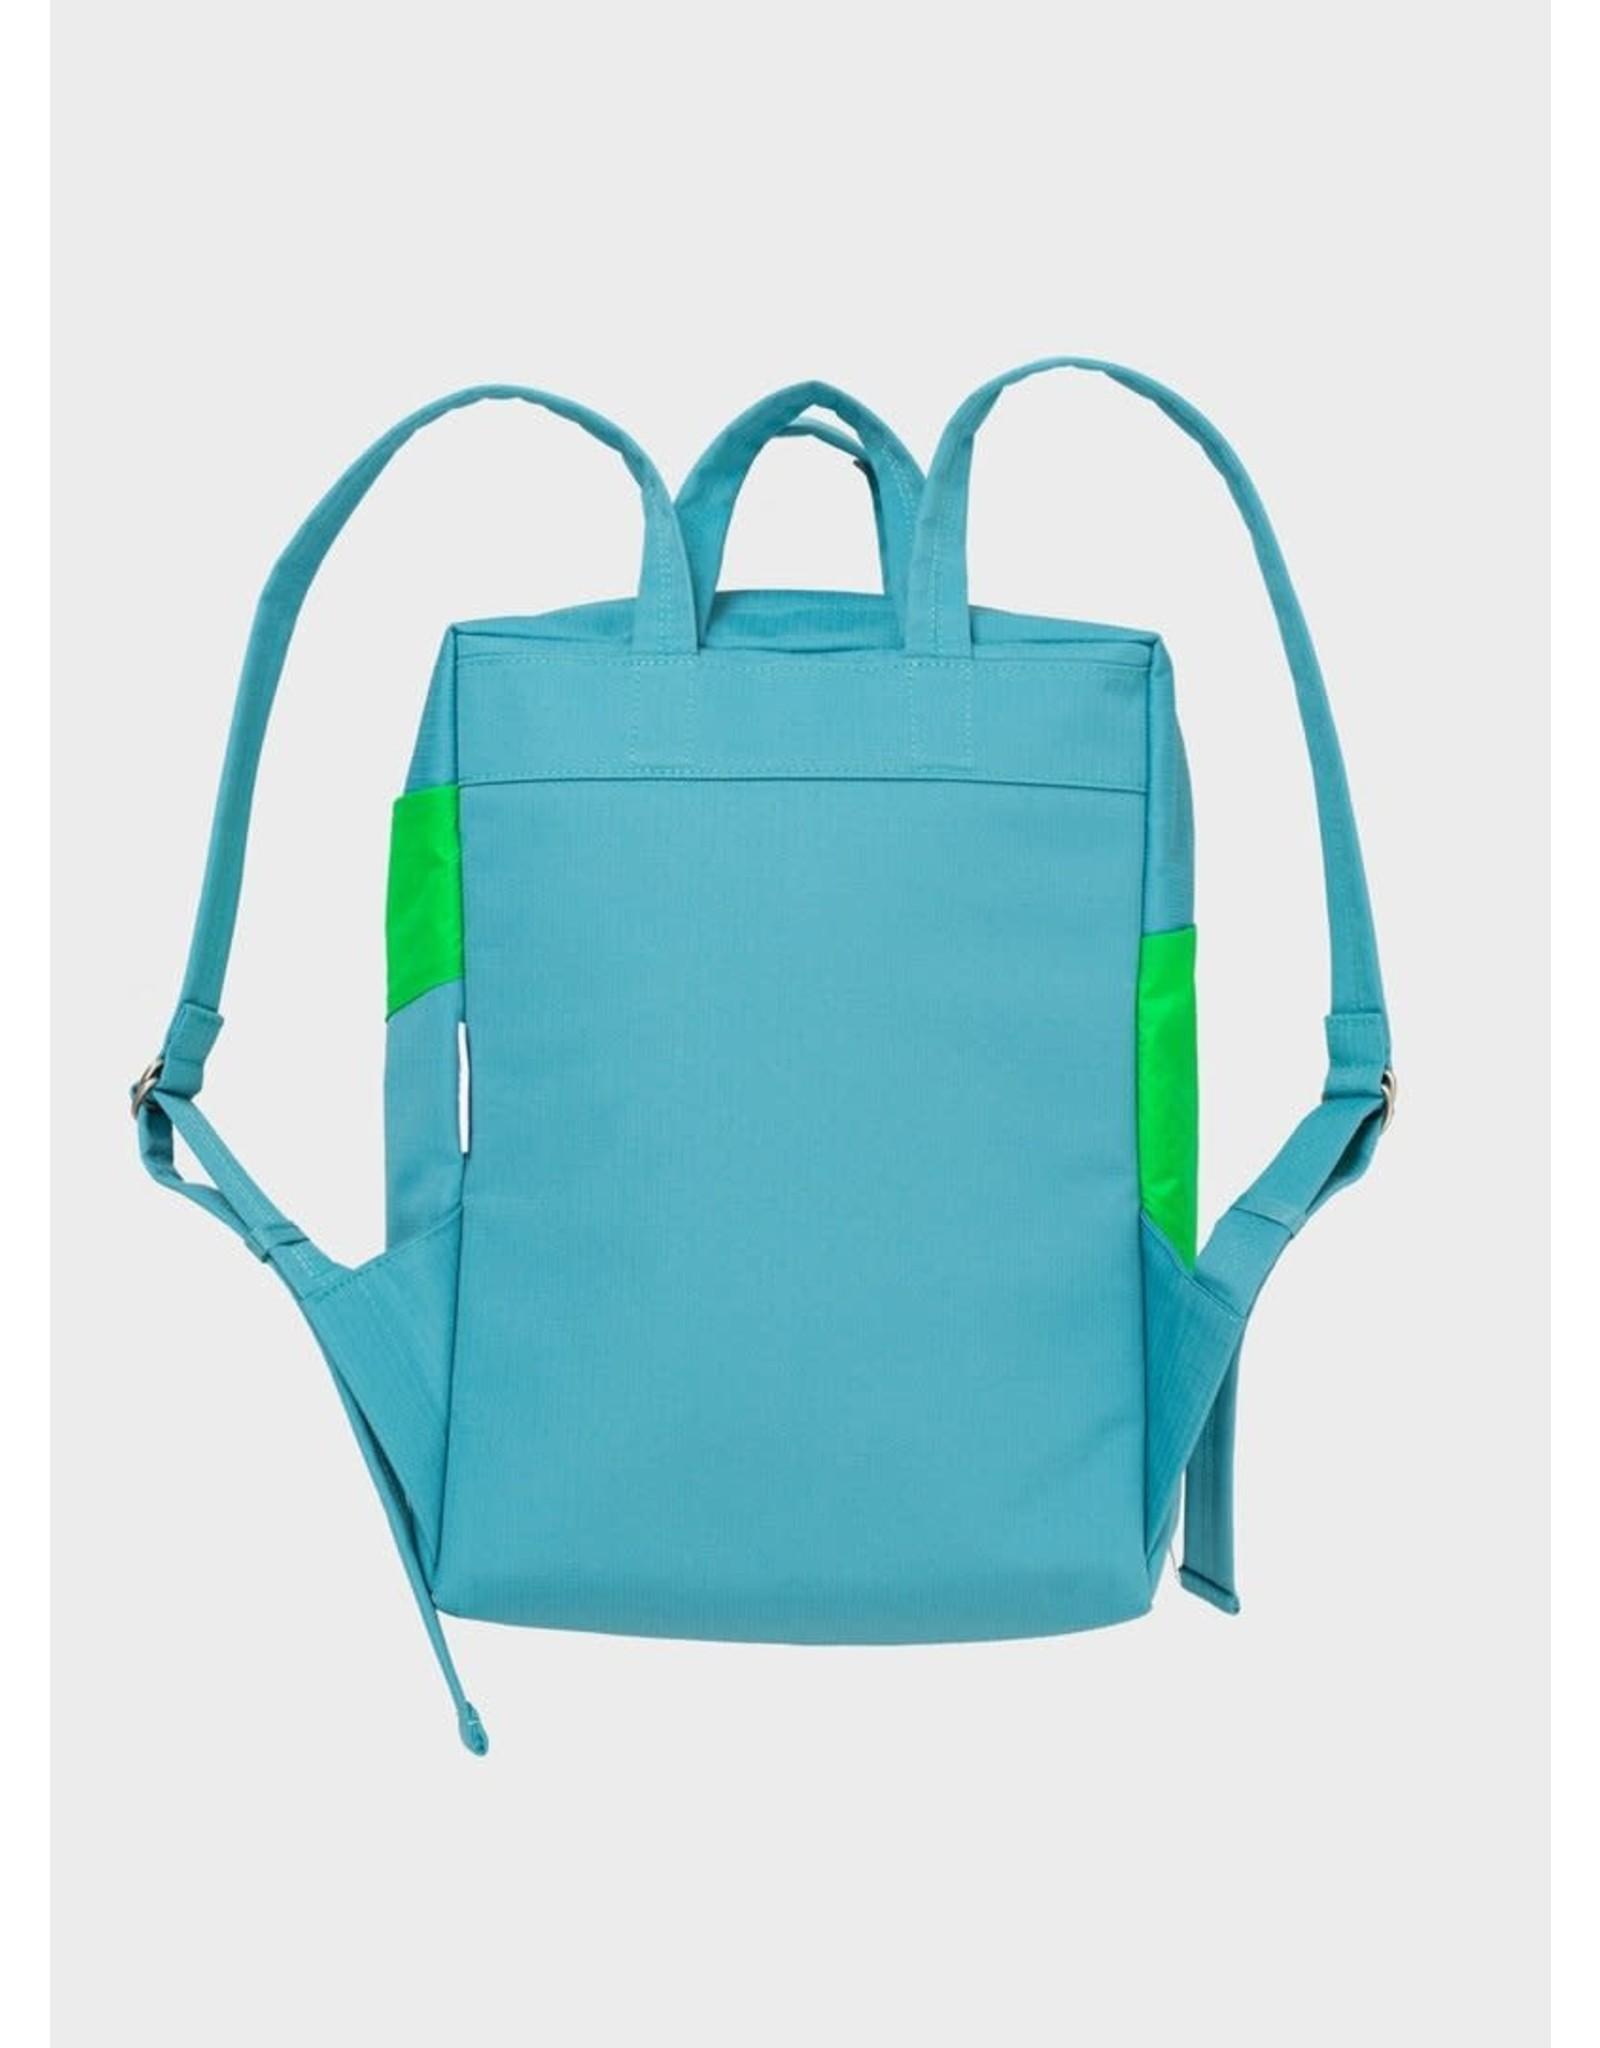 Susan Bijl Backpack, Concept & Greenscreen - One size